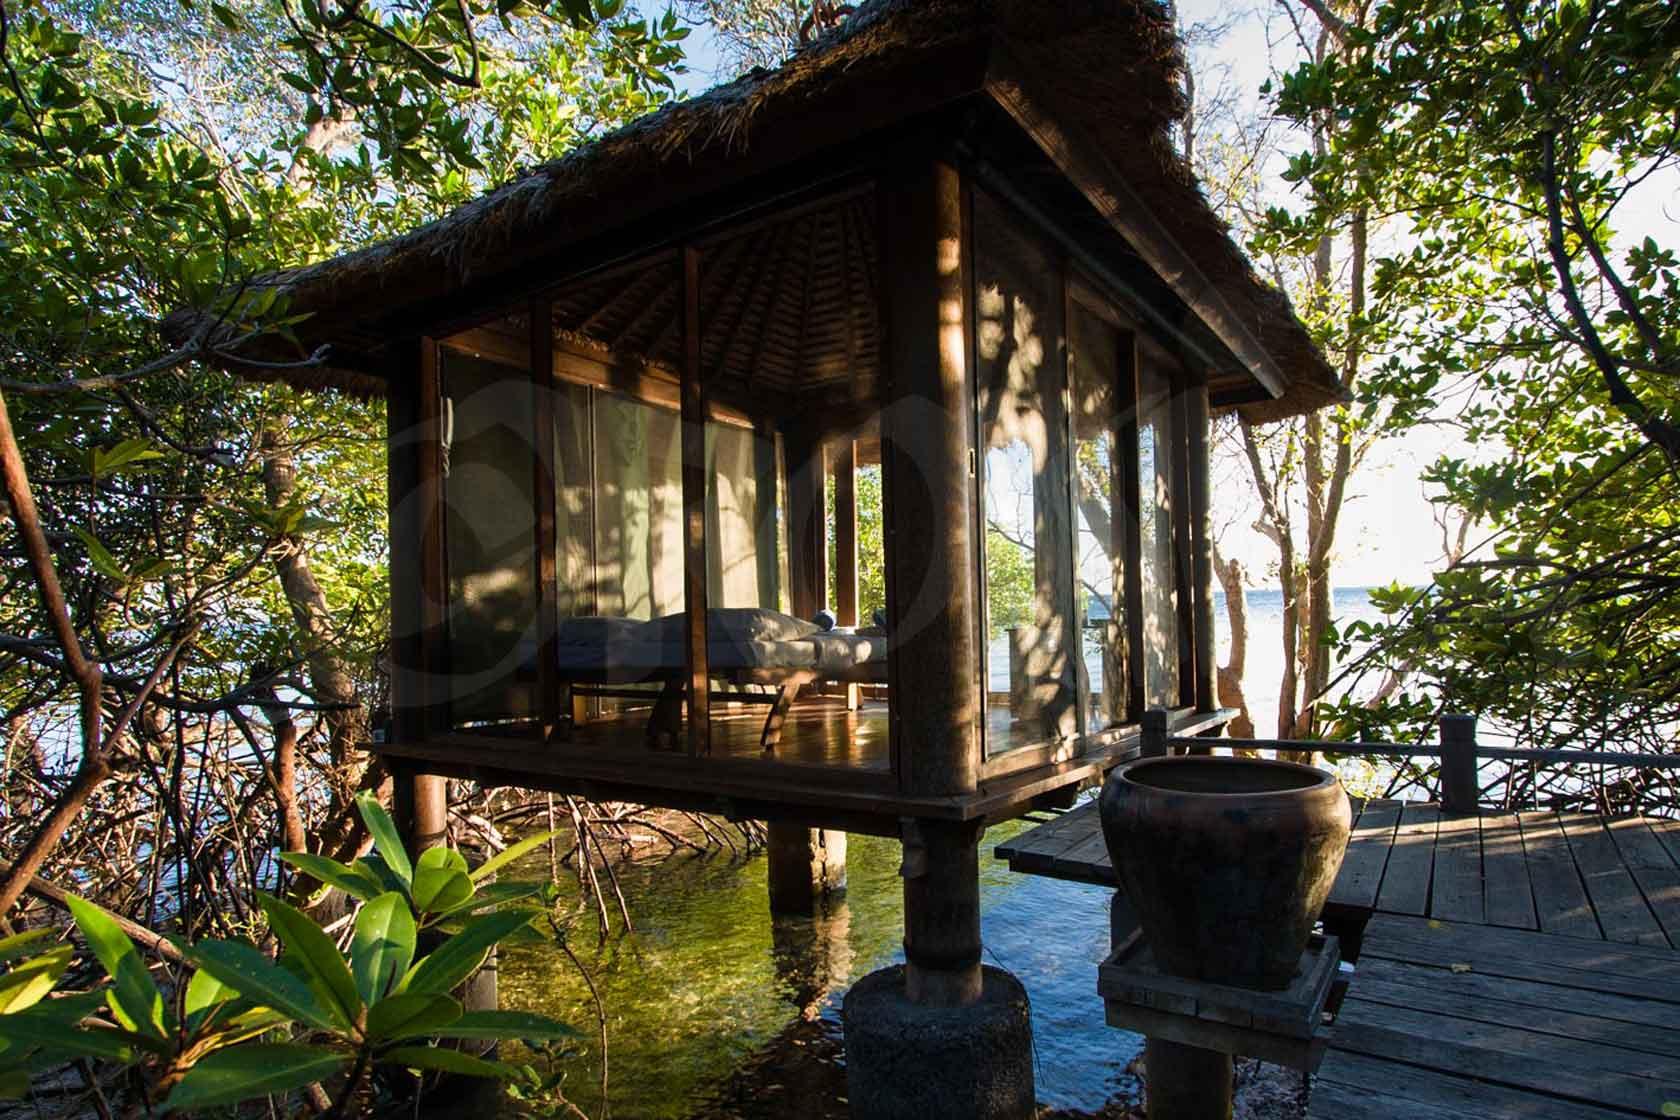 Bali Menjangan